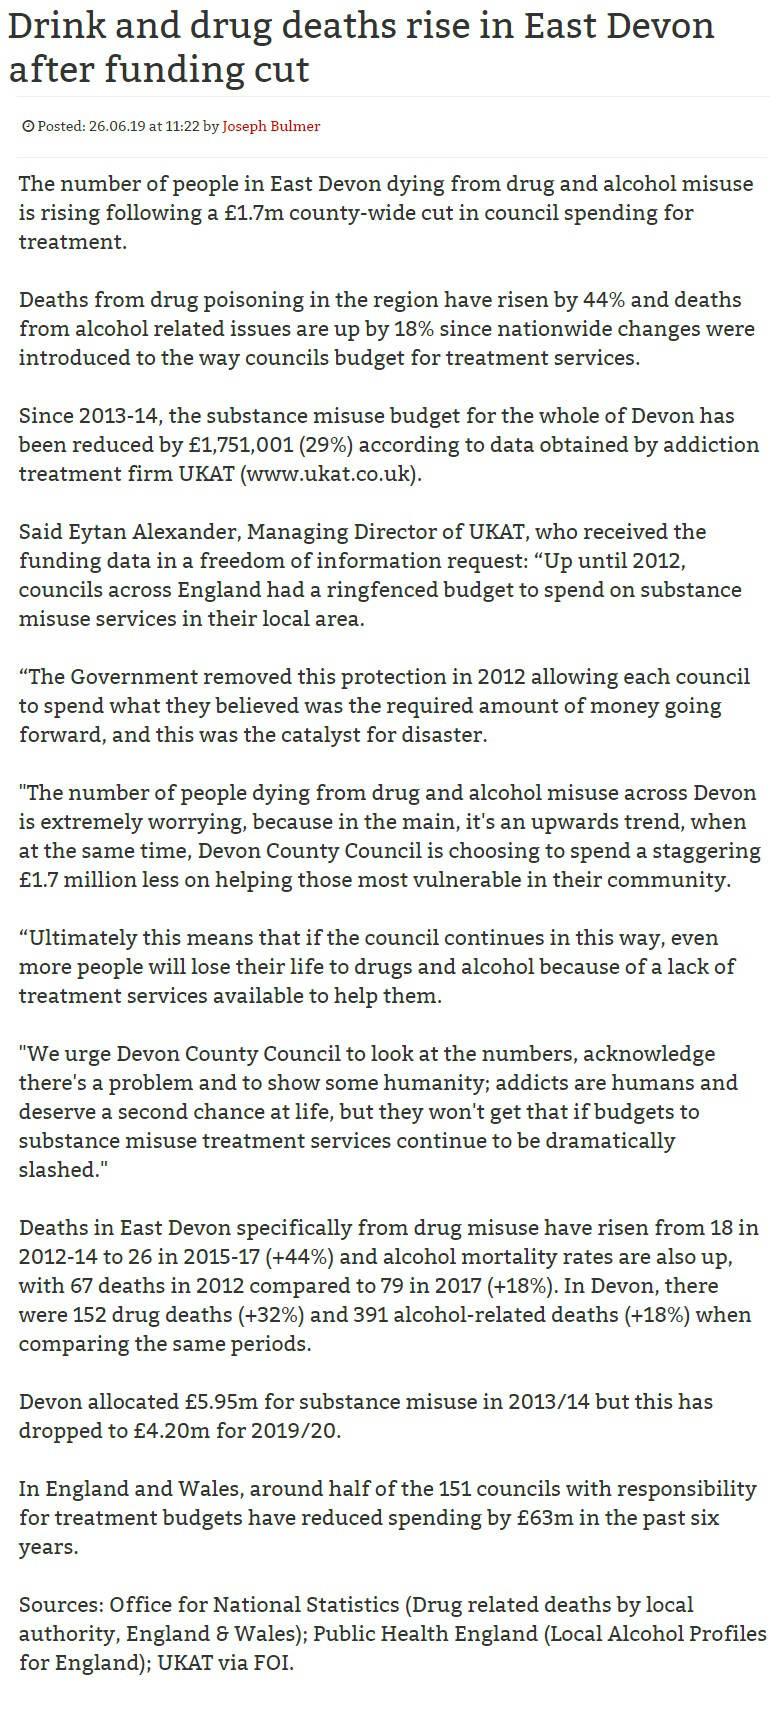 Exmouth News - UKATs Eytan Alexander on the Government Policies Regarding Addiction